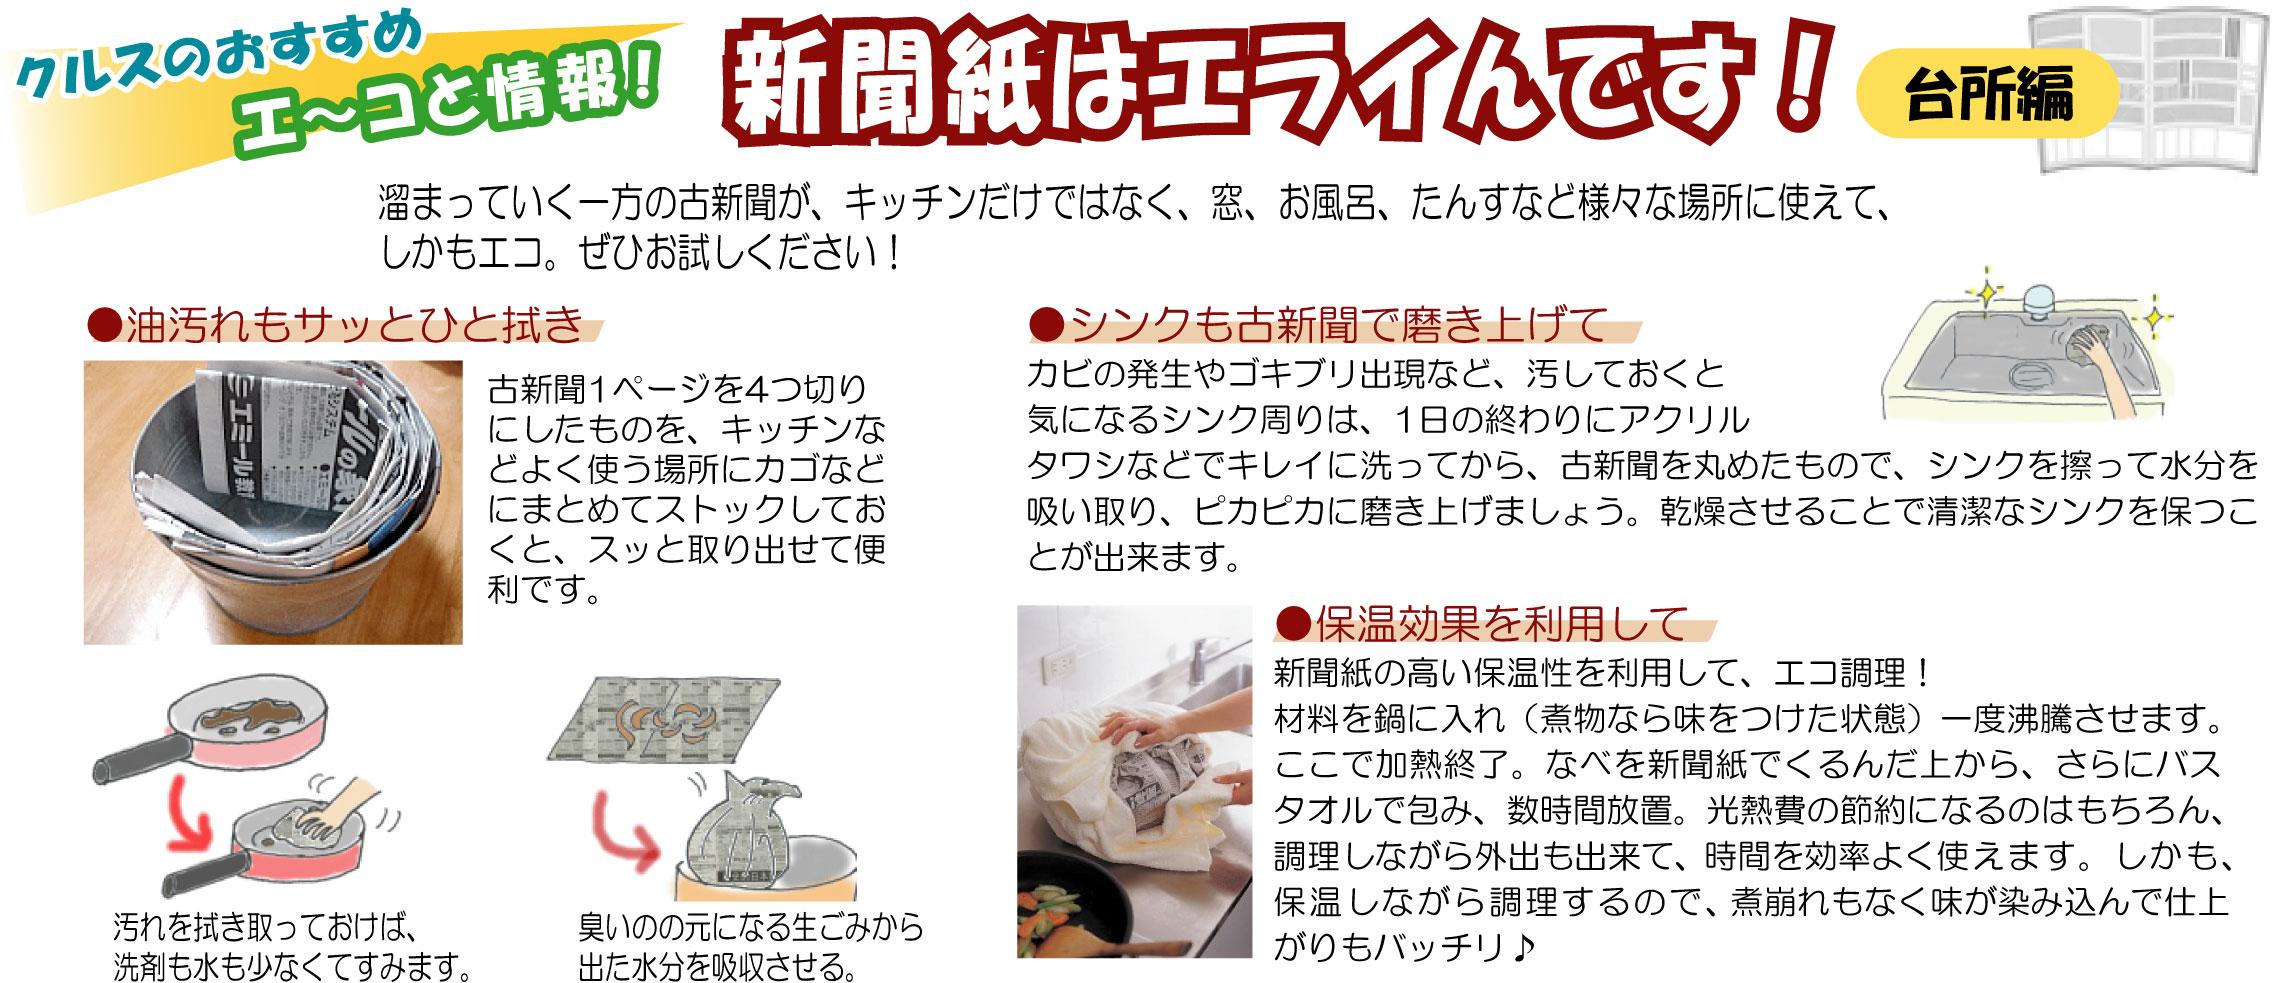 KuraSi-natu-sin67-10.jpg